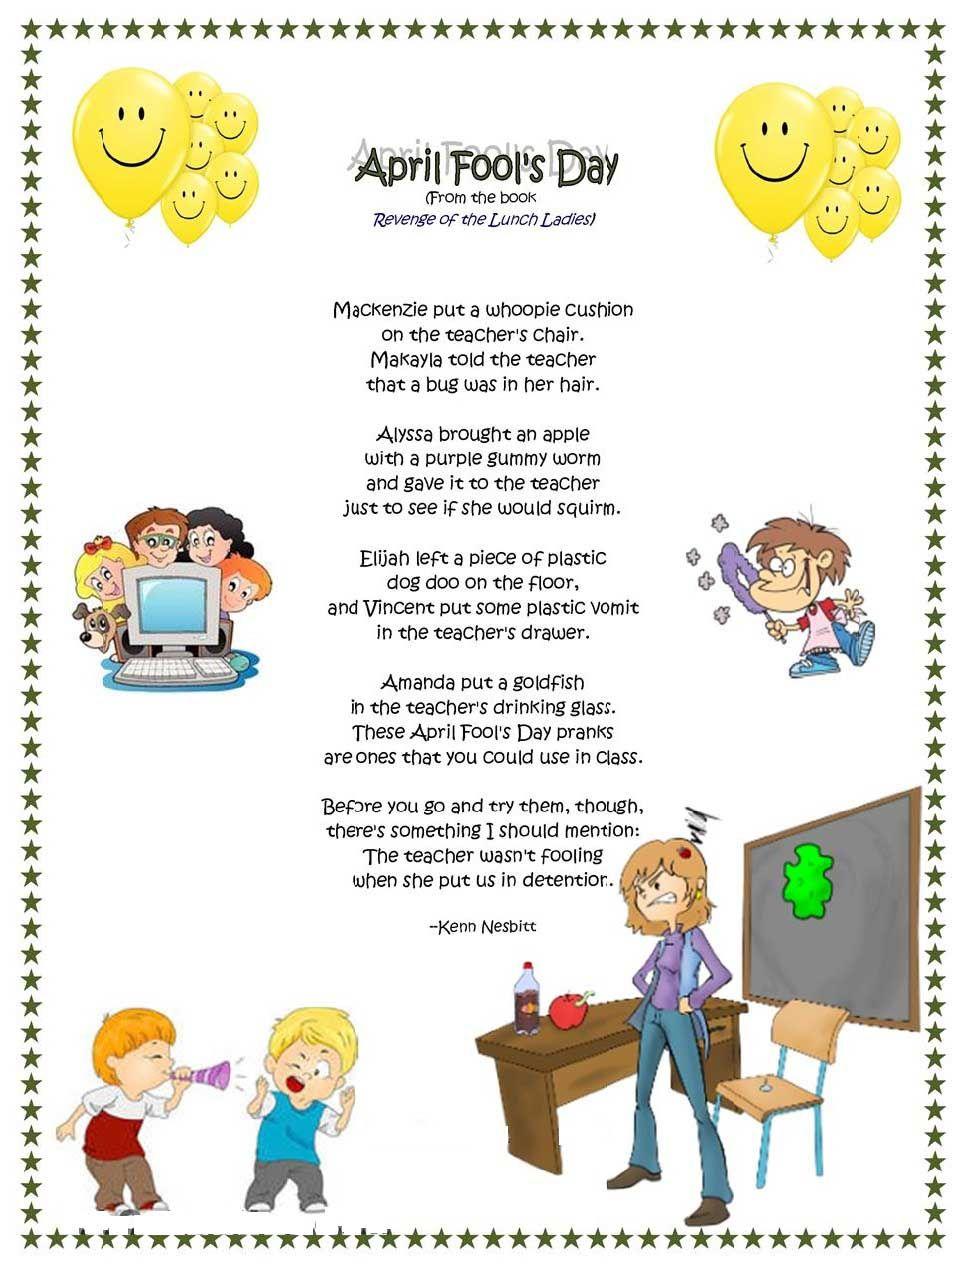 April Fools Day Funny Poems In Hindi \u0026 English   Kids Poems For All Fools  Day   Kids poems [ 1276 x 968 Pixel ]